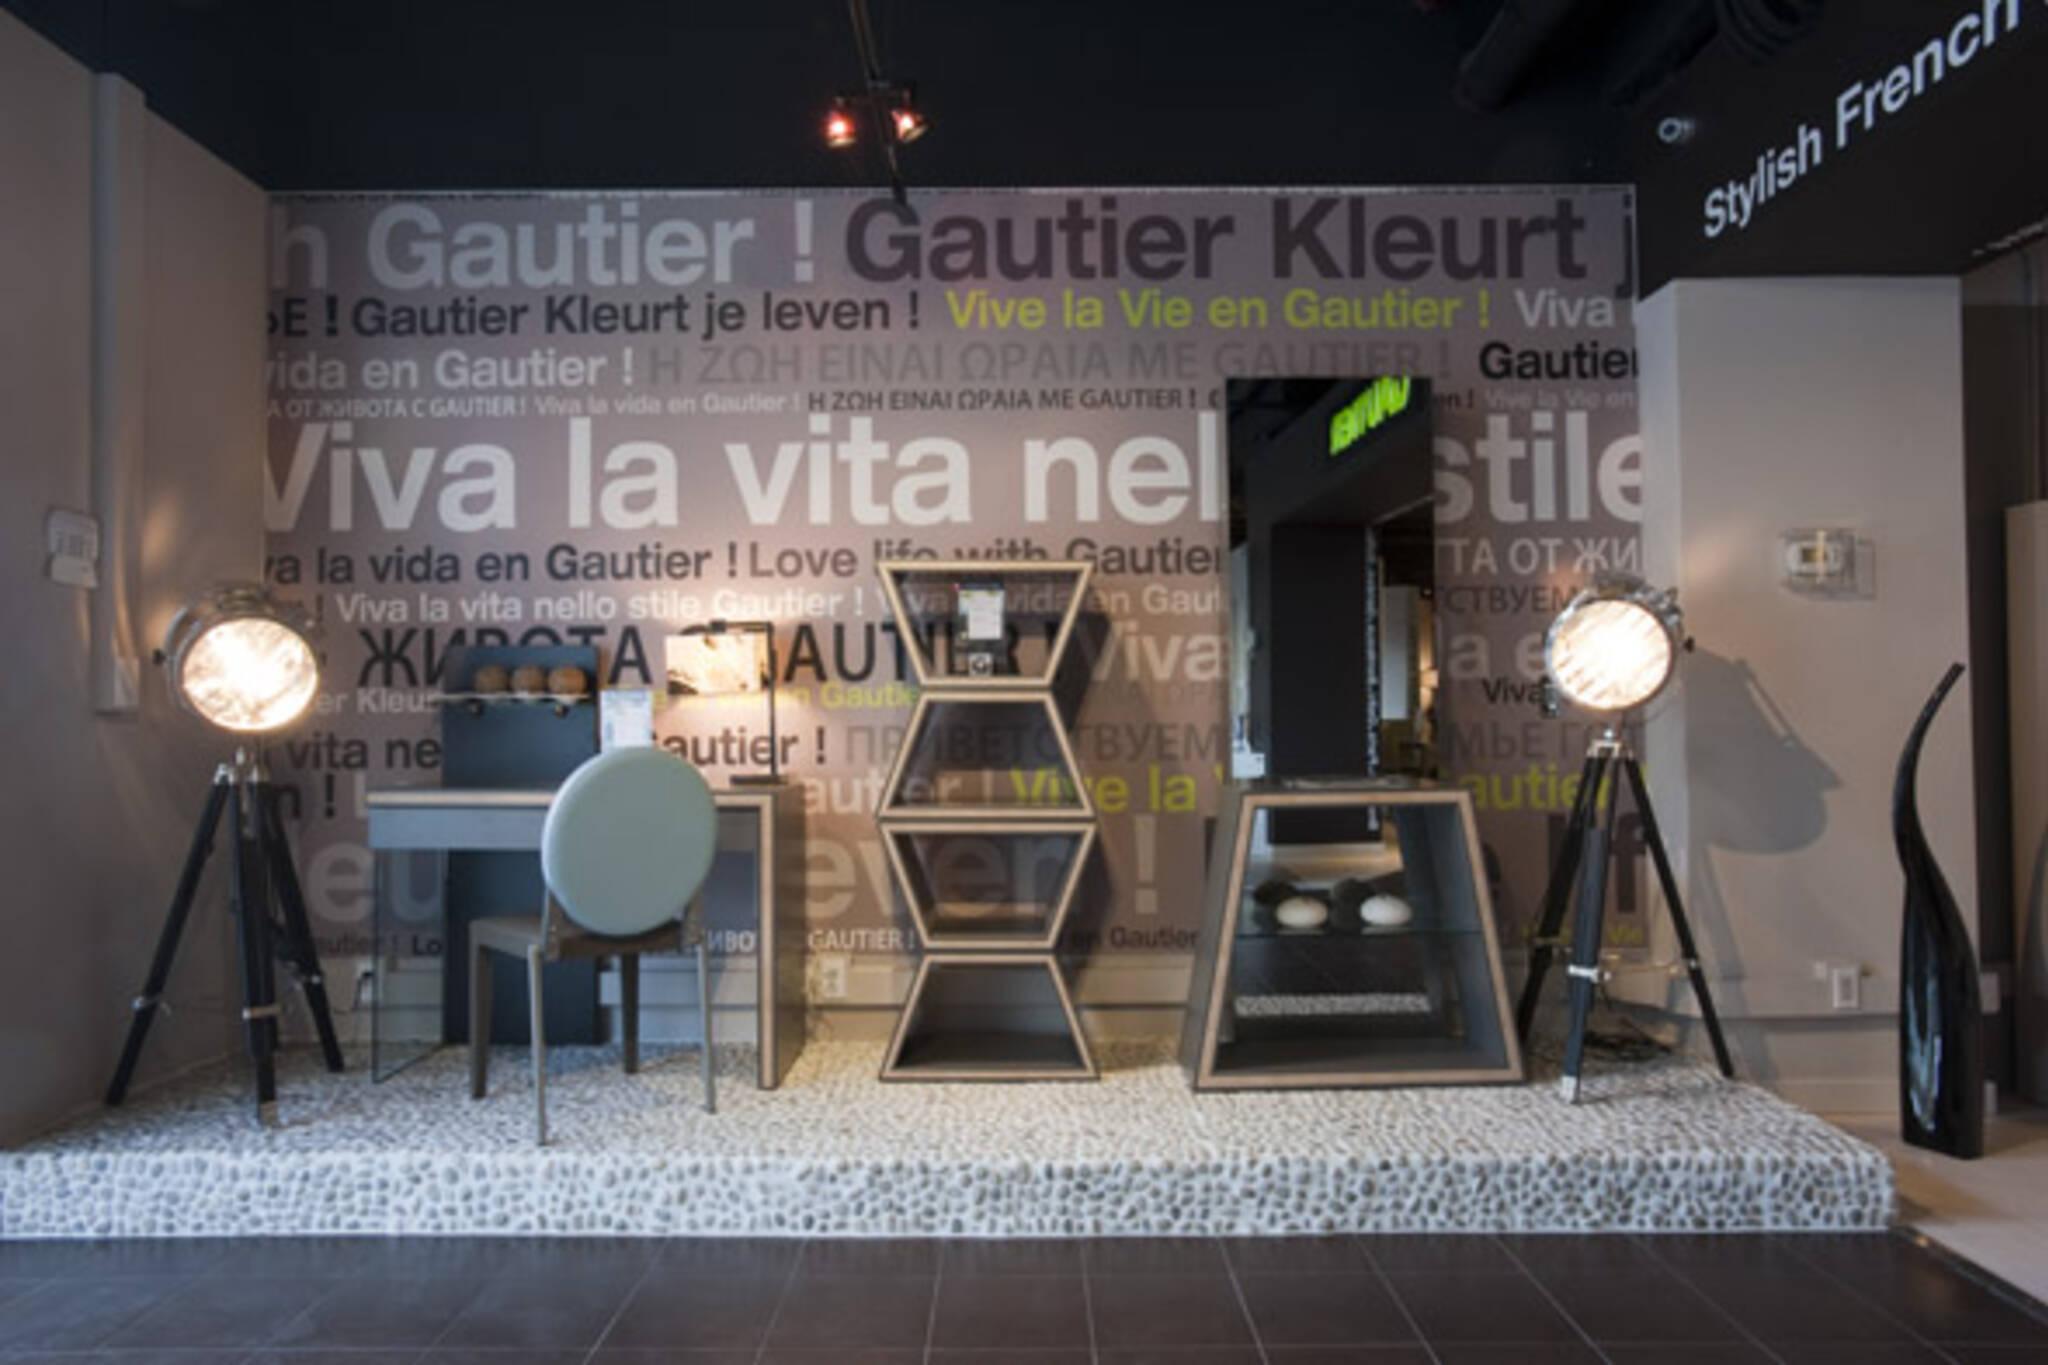 Gautier Toronto